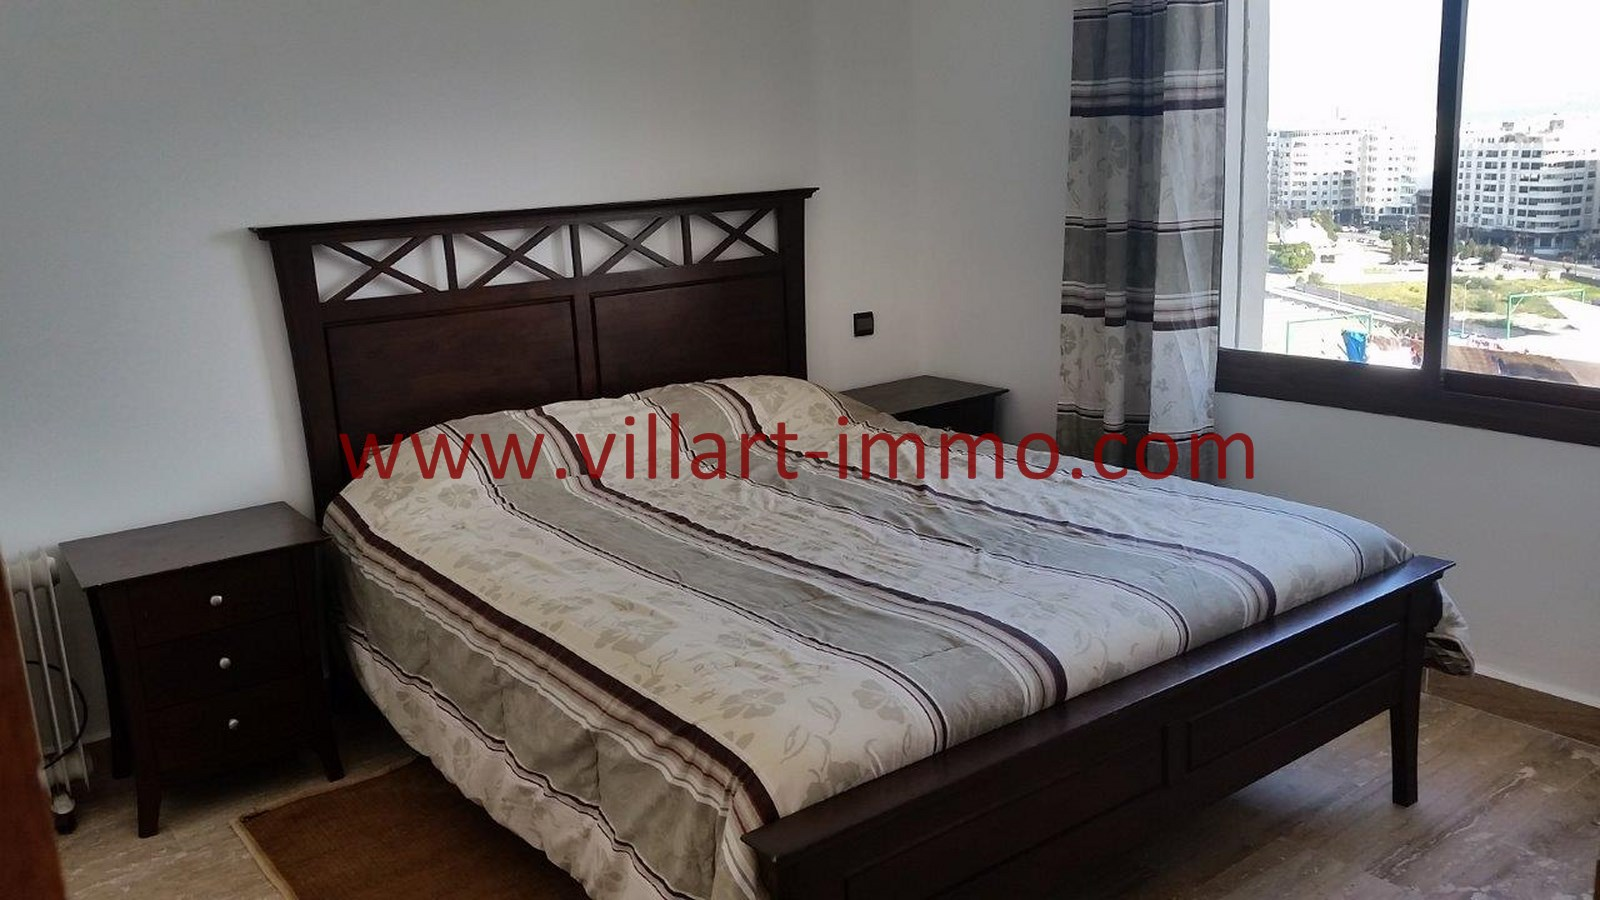 7-location-appartement-meuble-centre-ville-tanger-chambre-1-l909-villart-immo